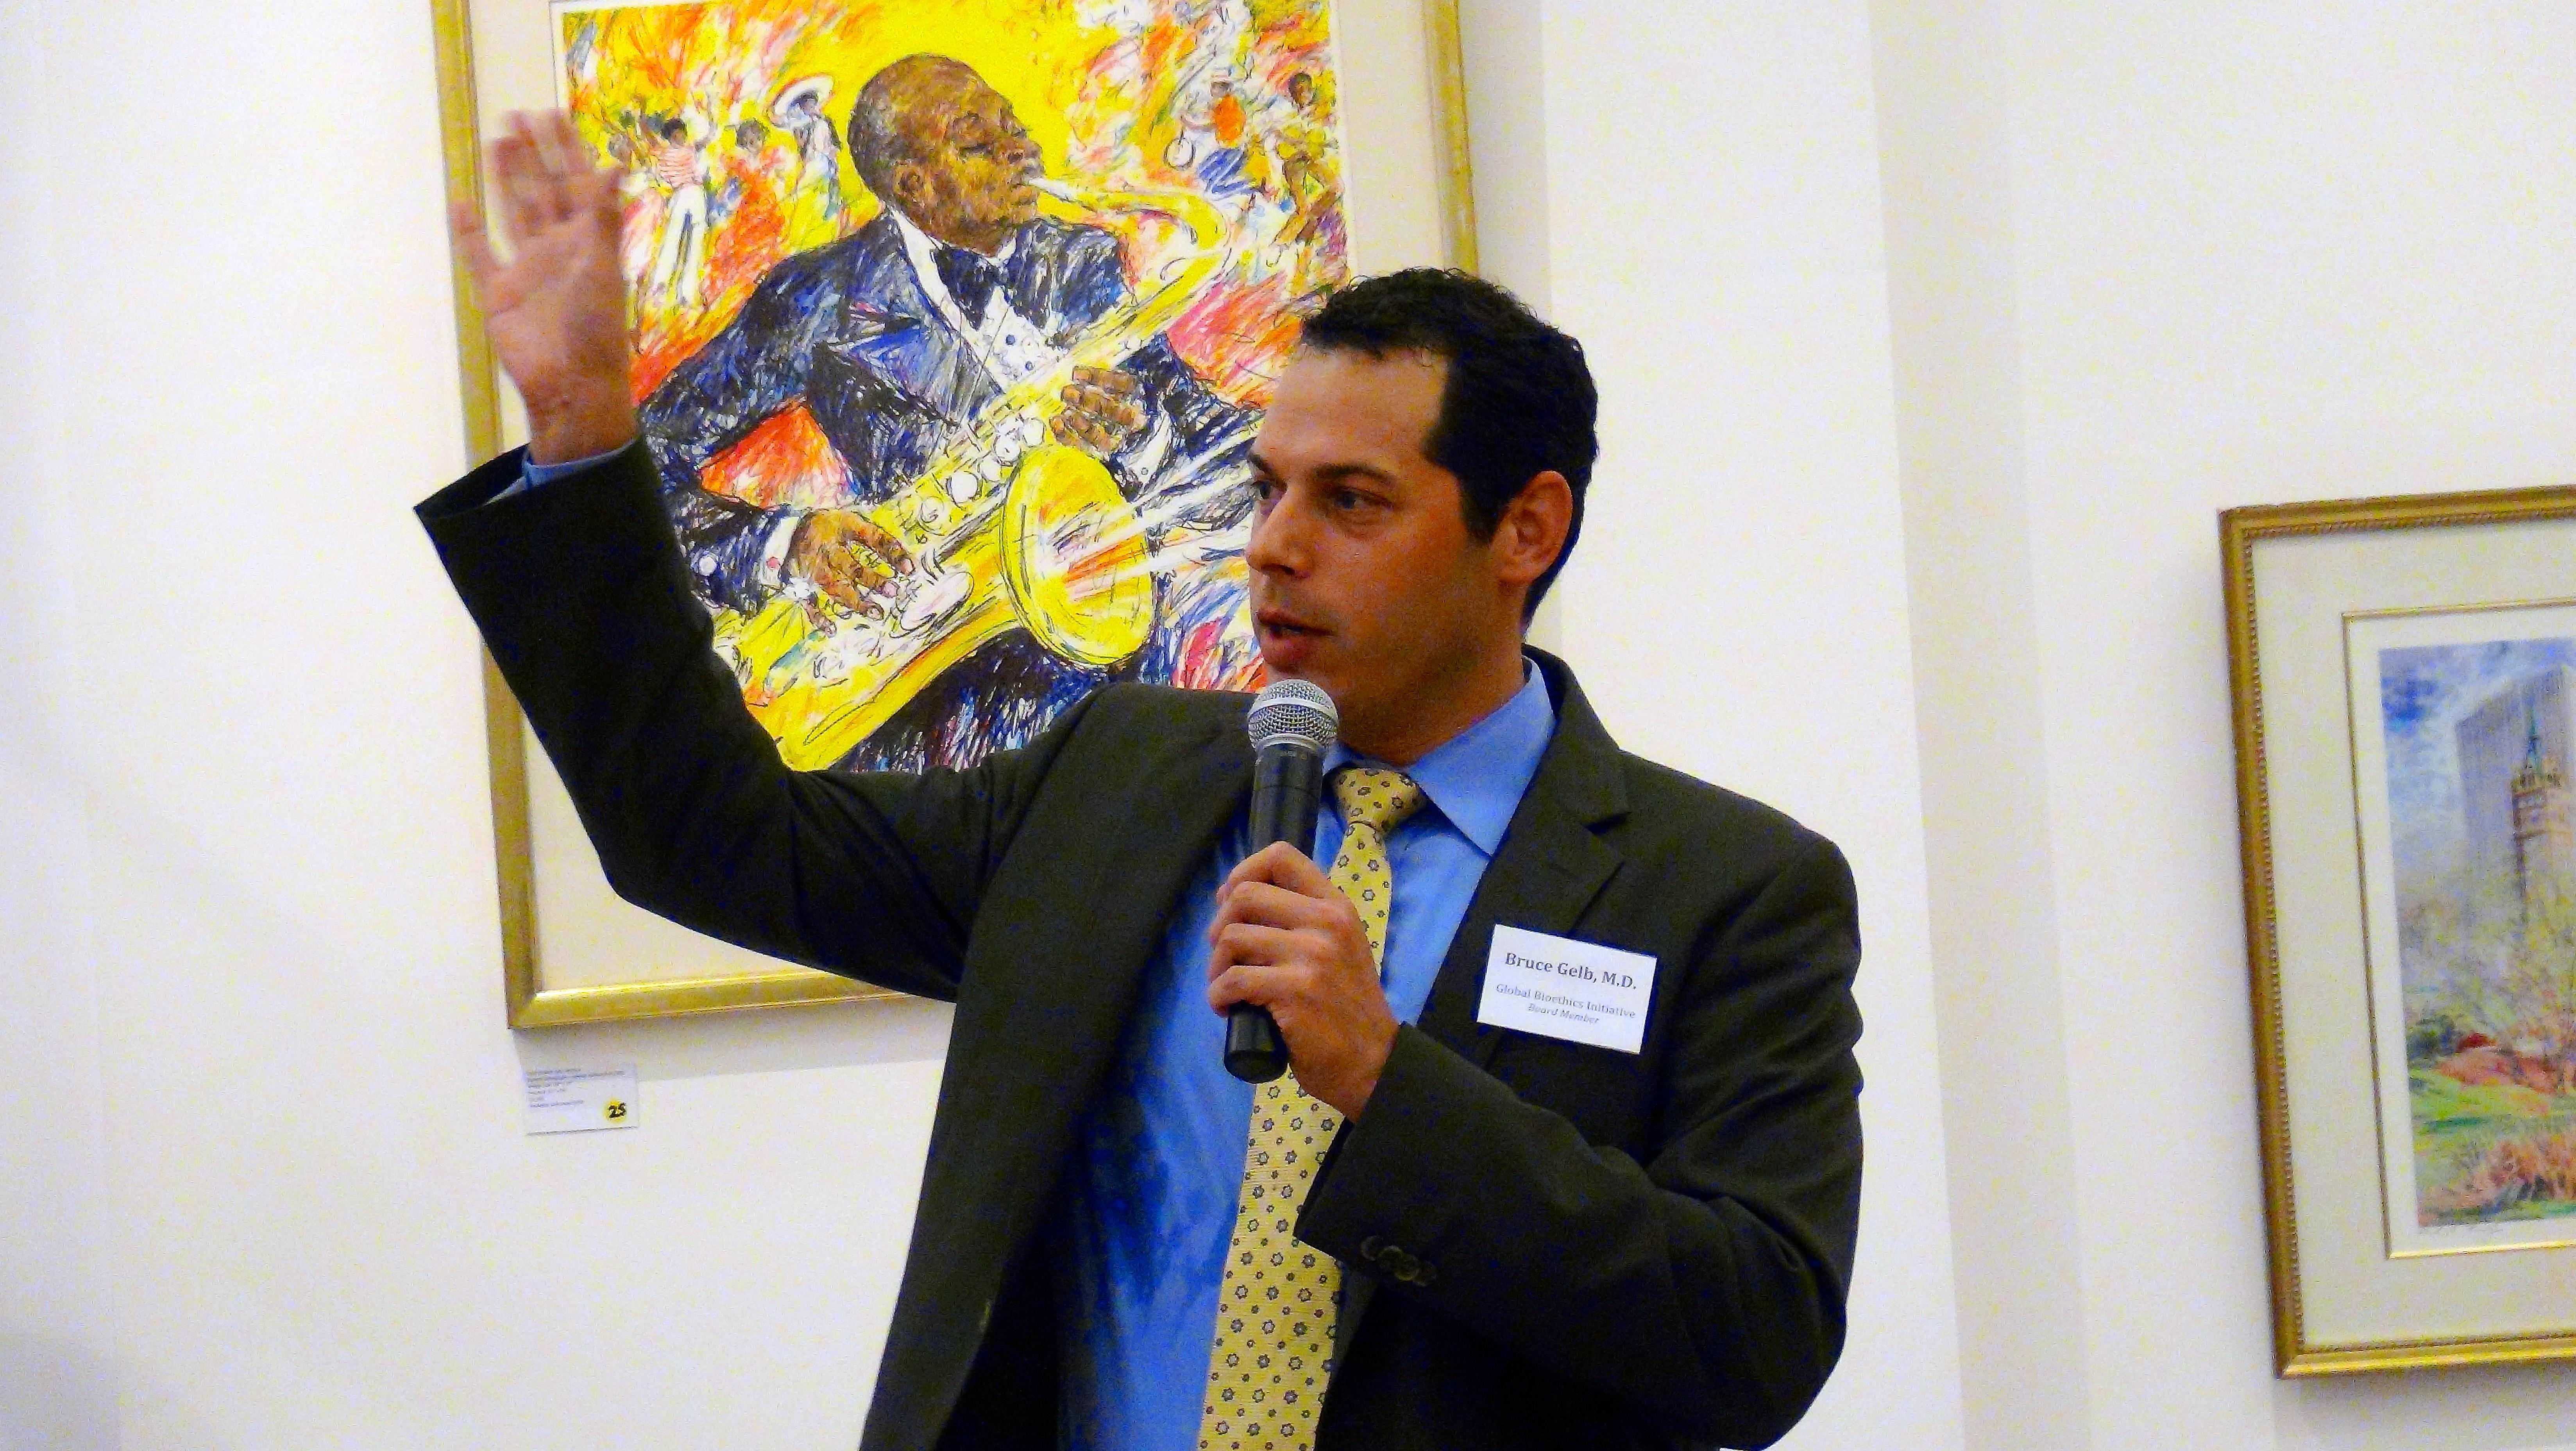 Bruce Gelb M.D., F.A.C.S and GBI board member